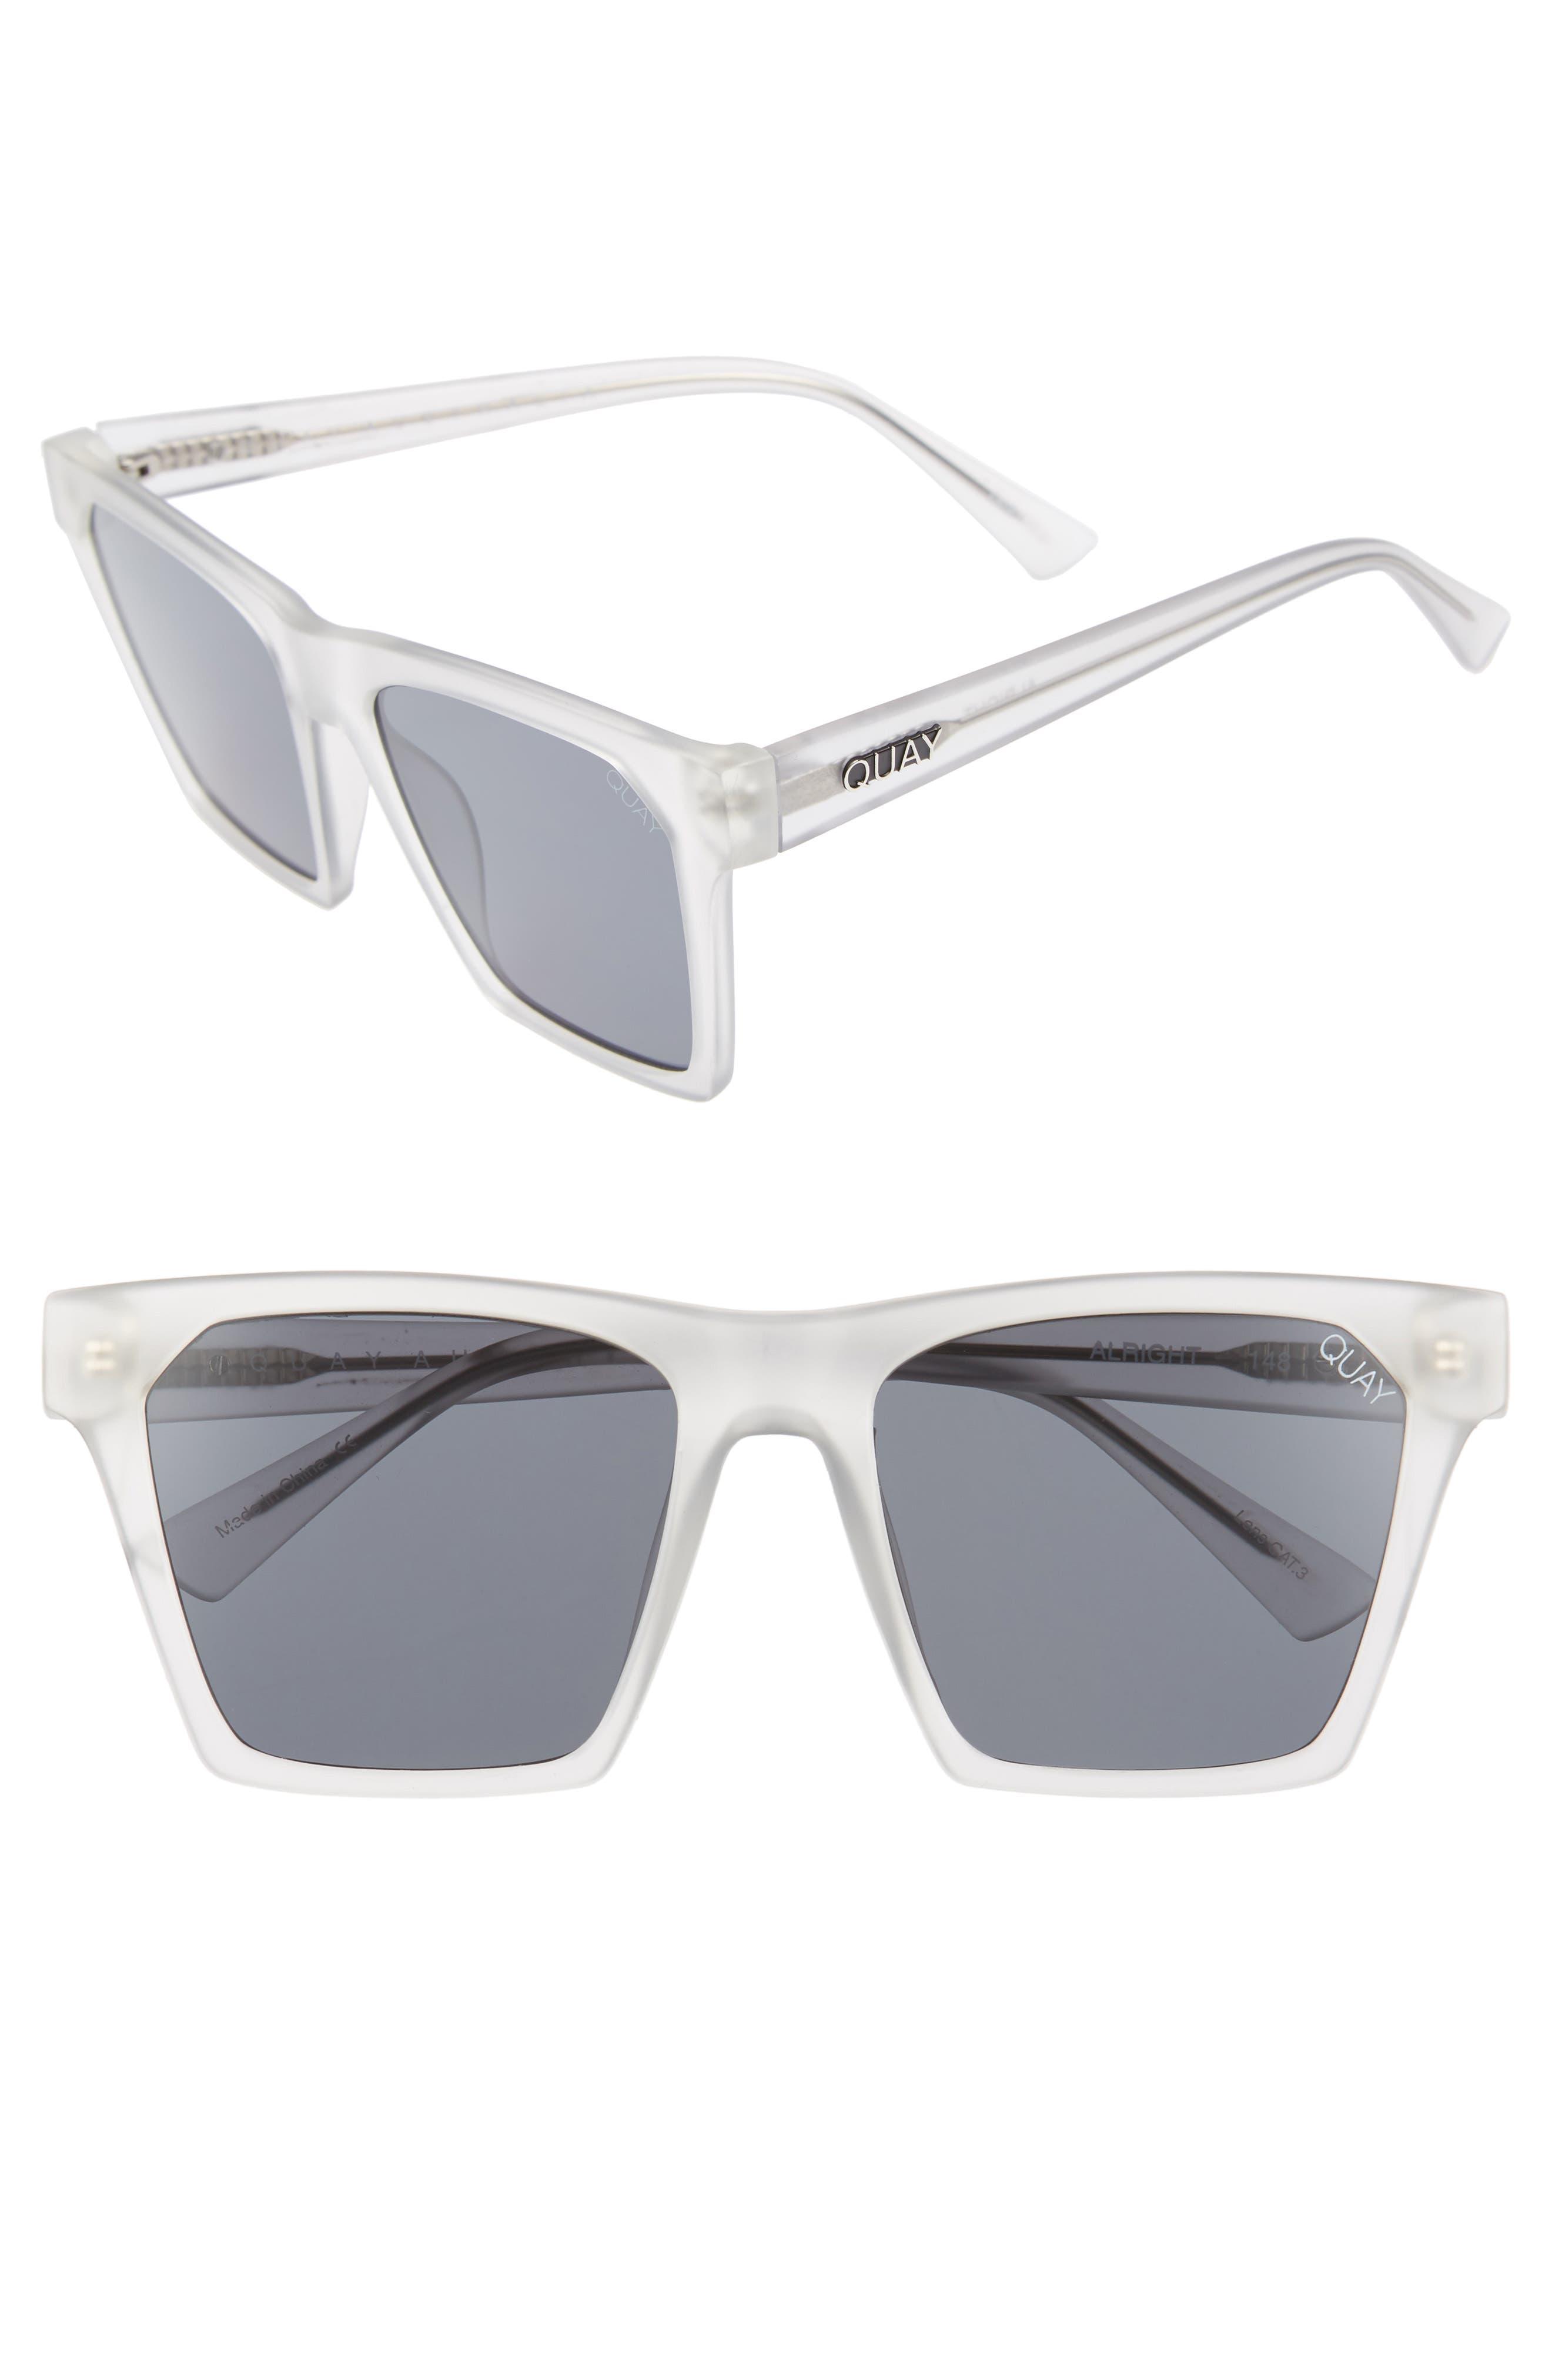 Main Image - Quay Australia x Missguided Alright 55mm Square Sunglasses